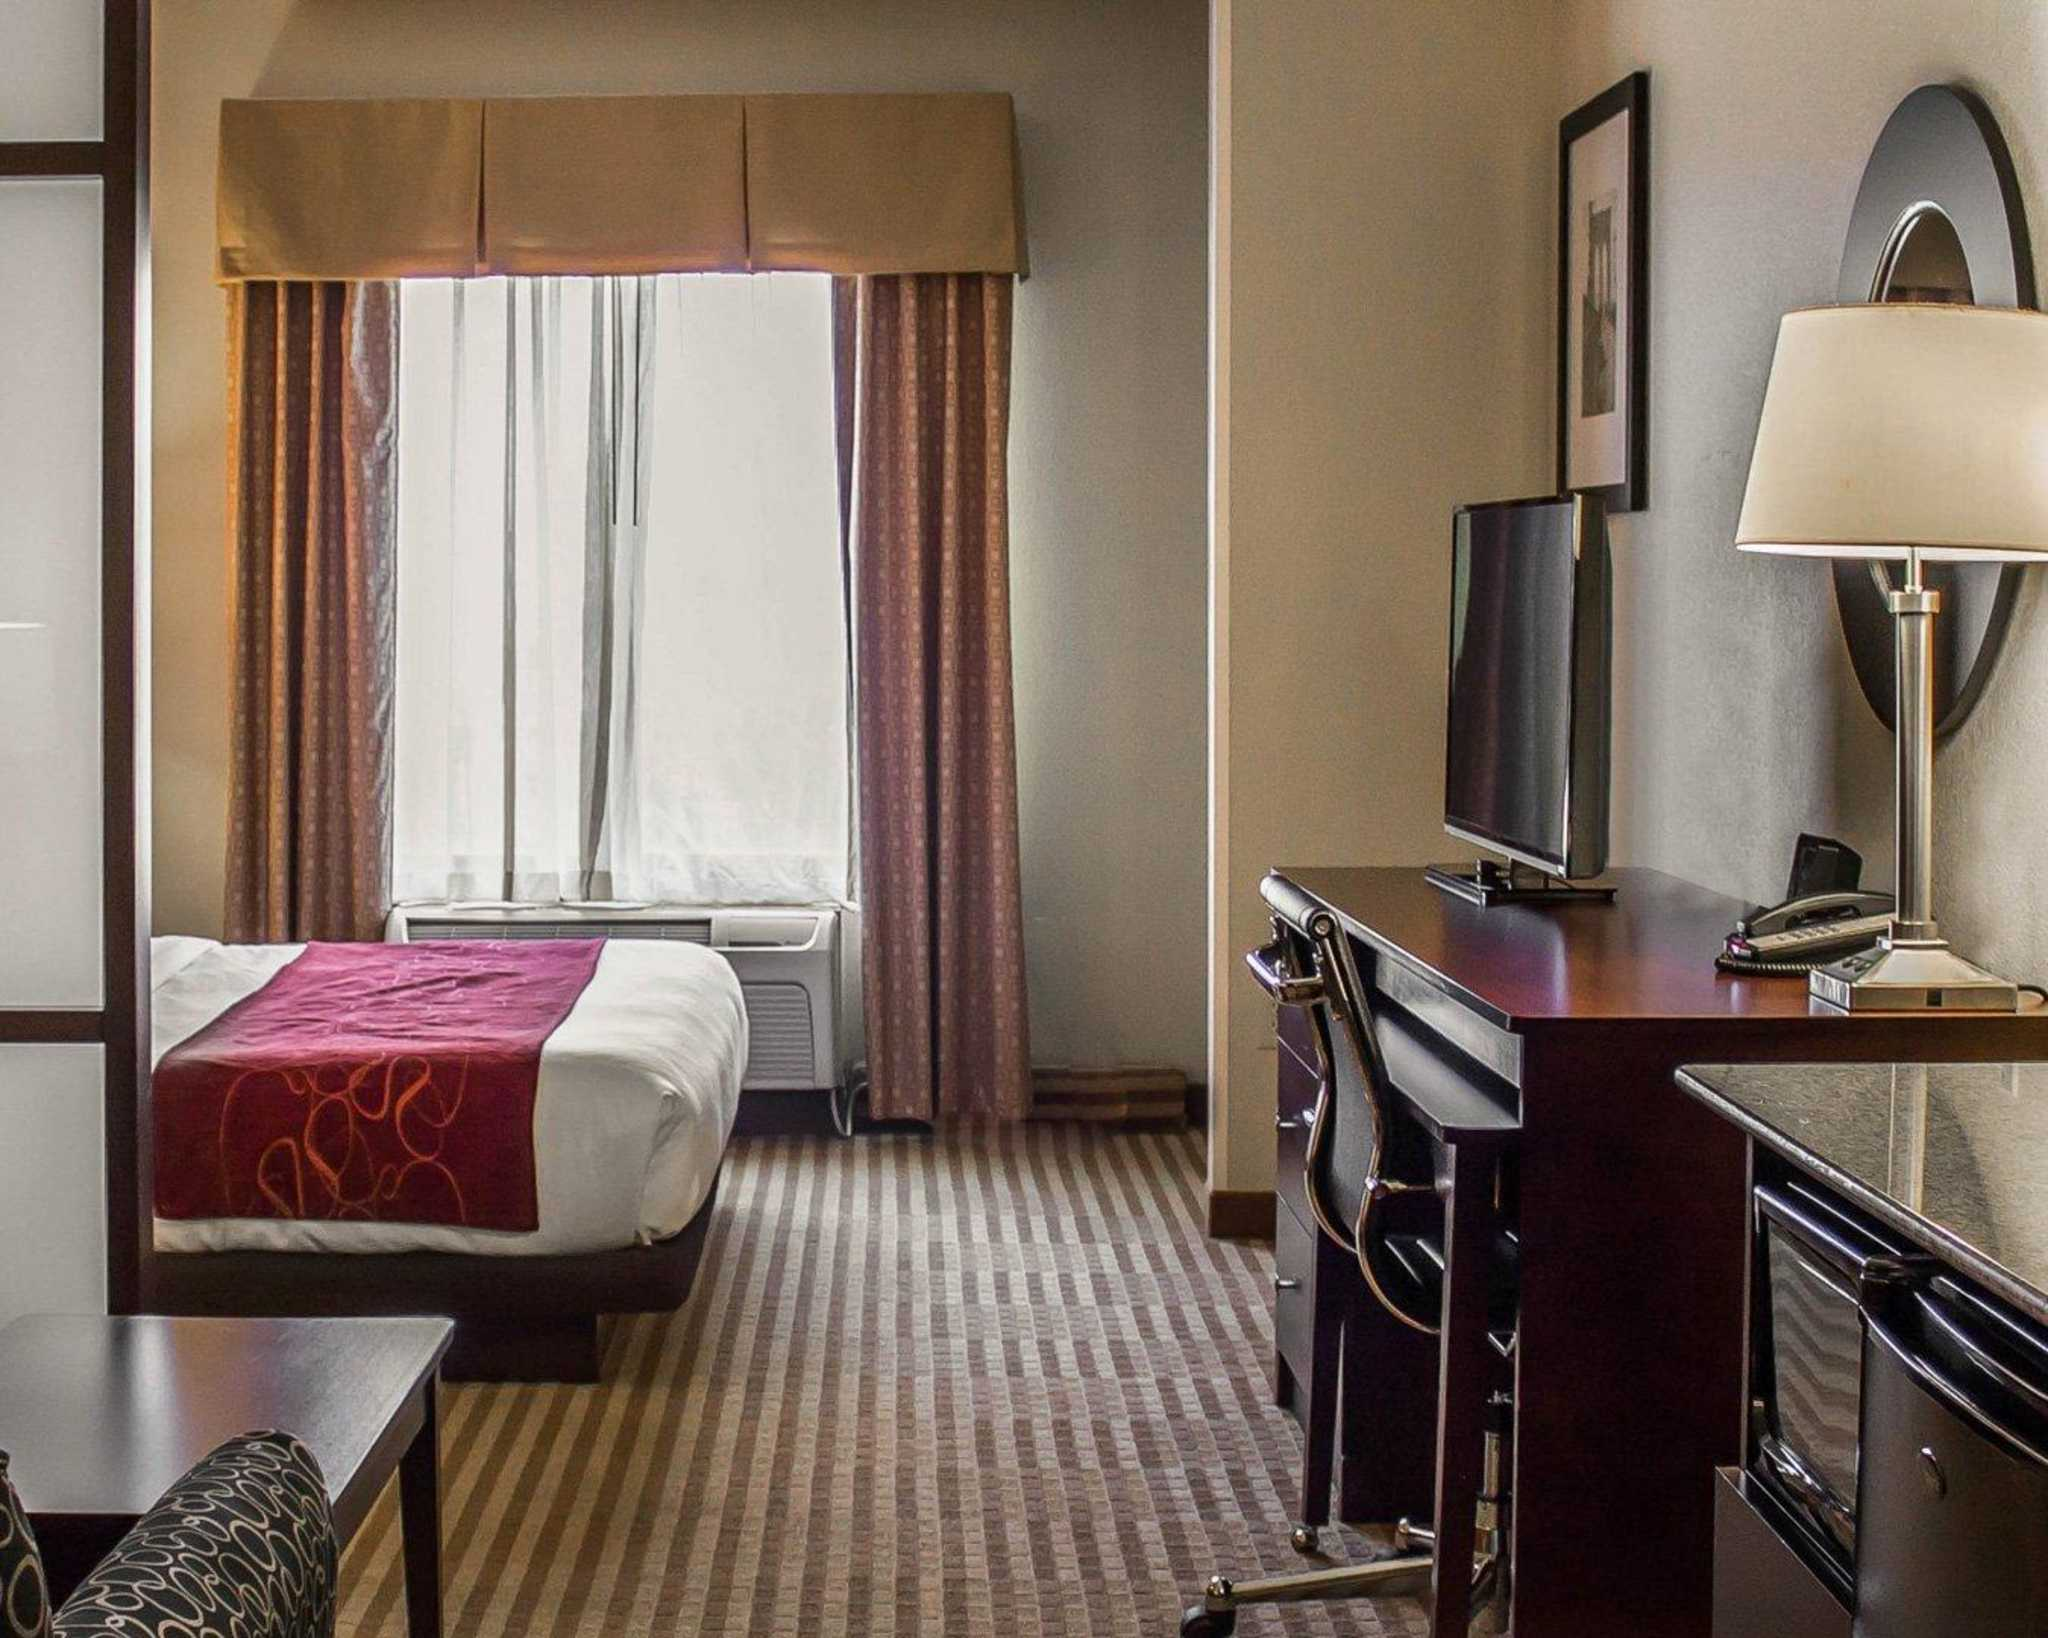 Comfort Suites East Broad at 270 image 30